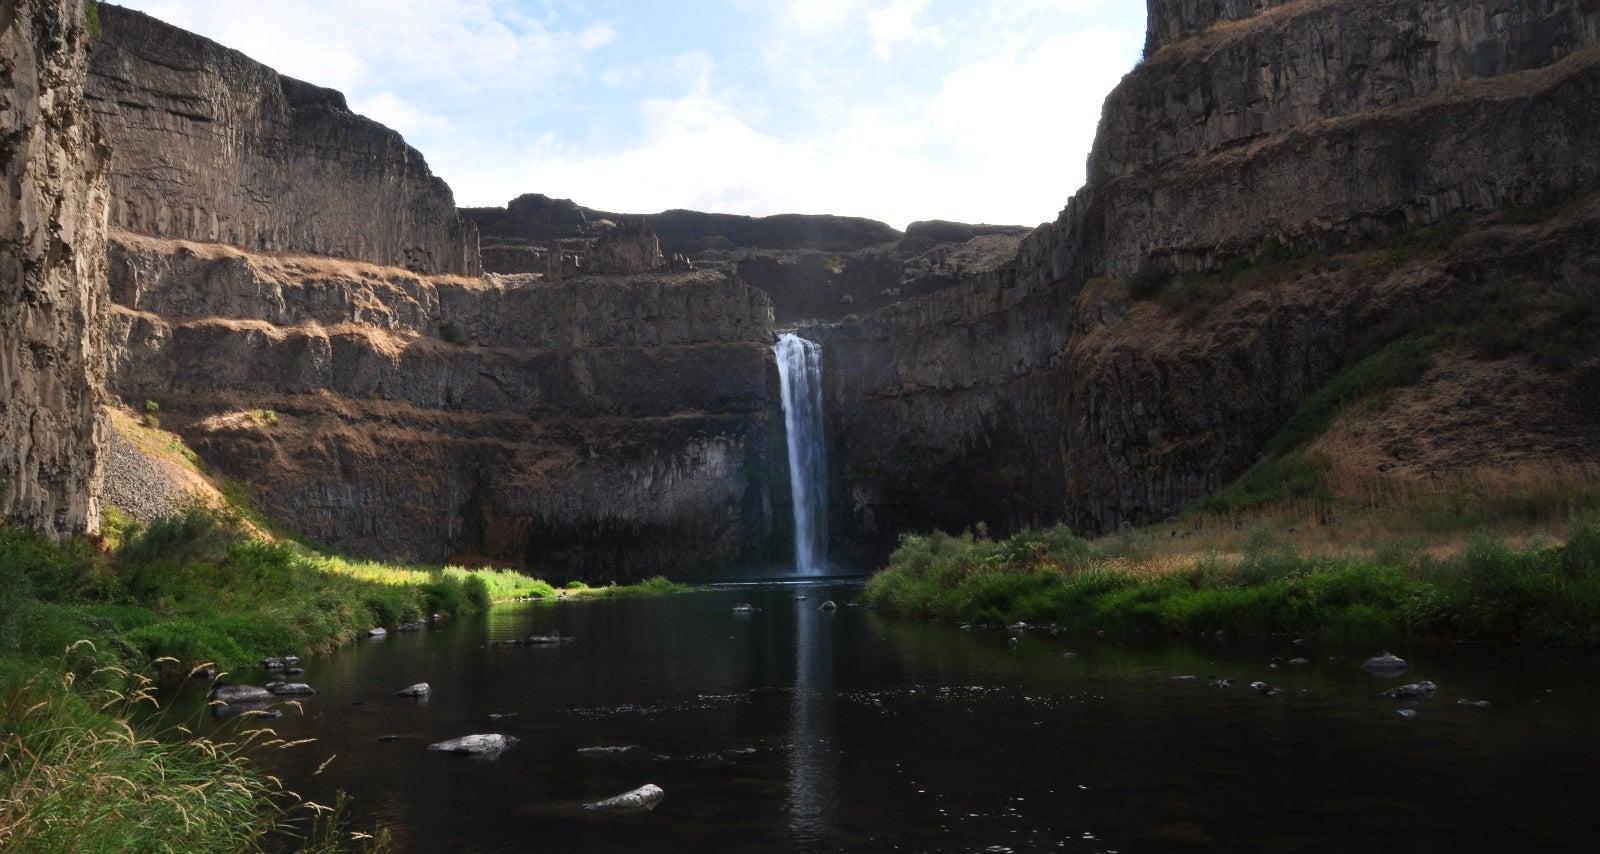 100 days outdoors: week one in Idaho